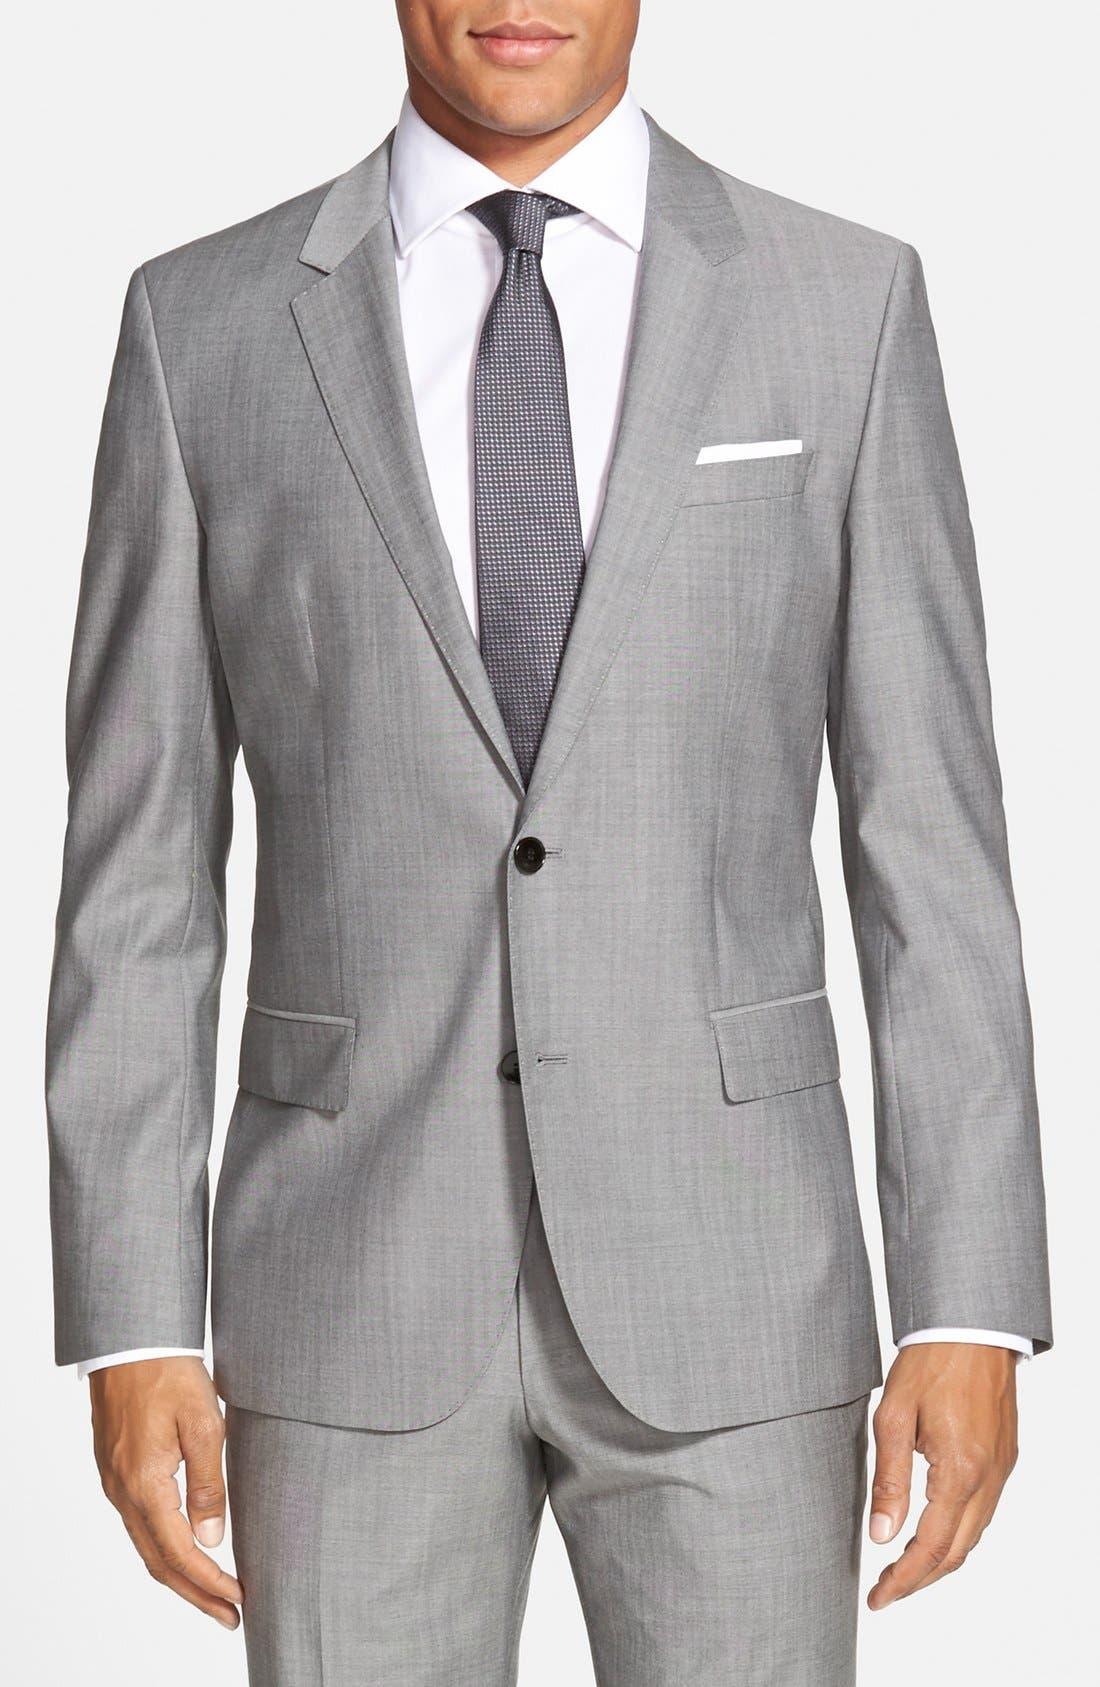 'Huge/Genius' Trim Fit Solid Wool Suit,                             Alternate thumbnail 13, color,                             PEARL GREY